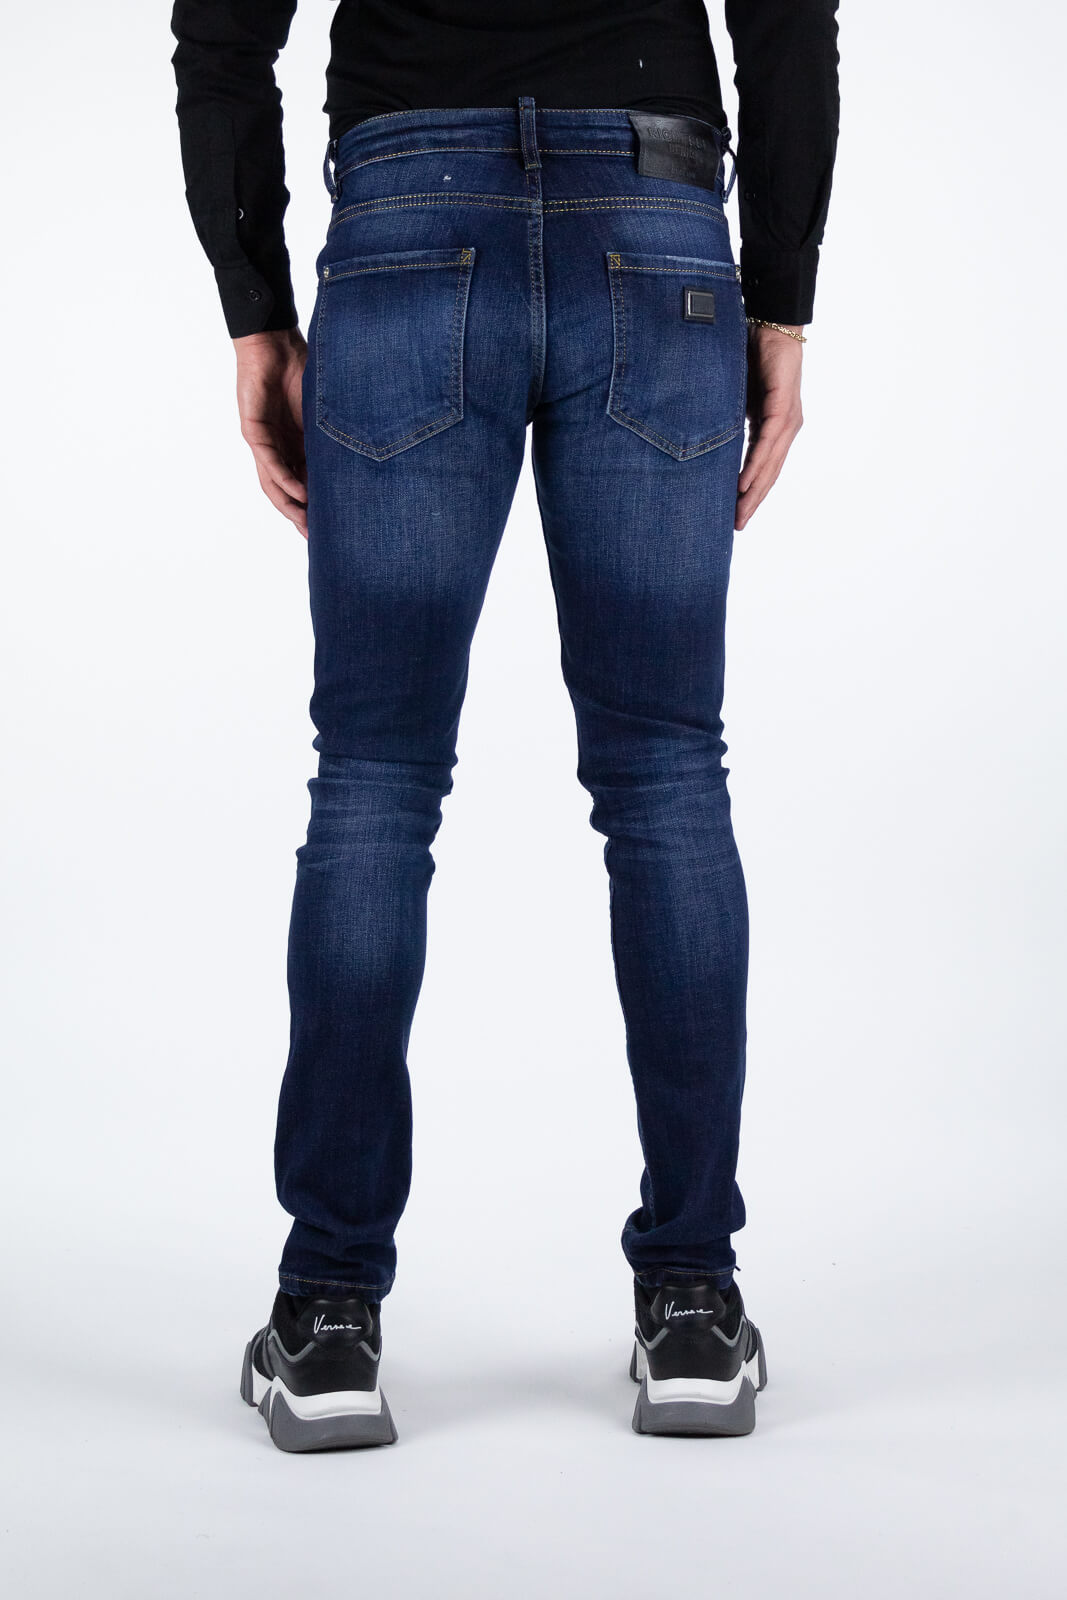 Talara Bleu Jeans-4